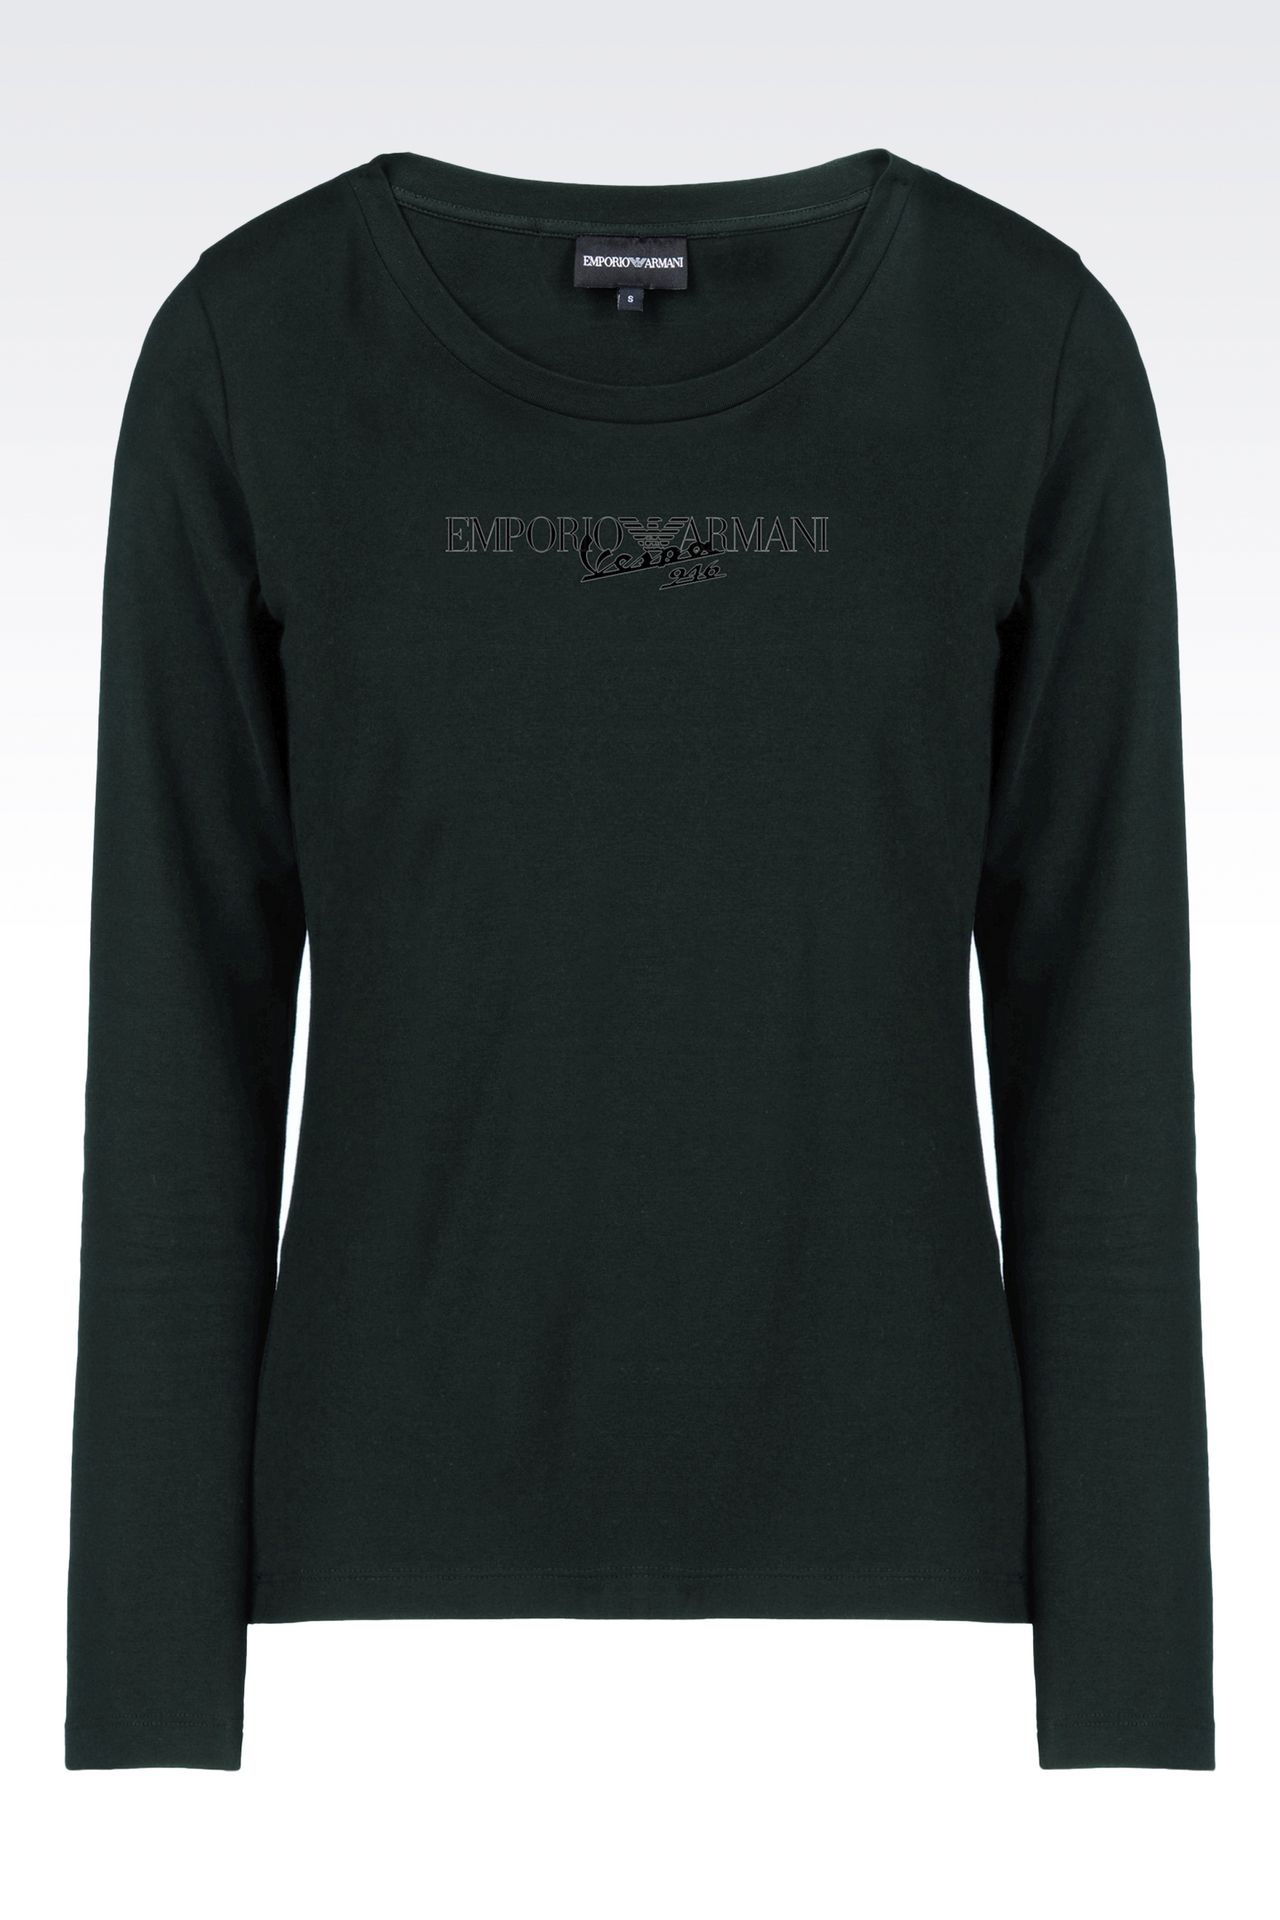 emporio armani vespa 946 t shirt long sleeve t shirts women by armani. Black Bedroom Furniture Sets. Home Design Ideas